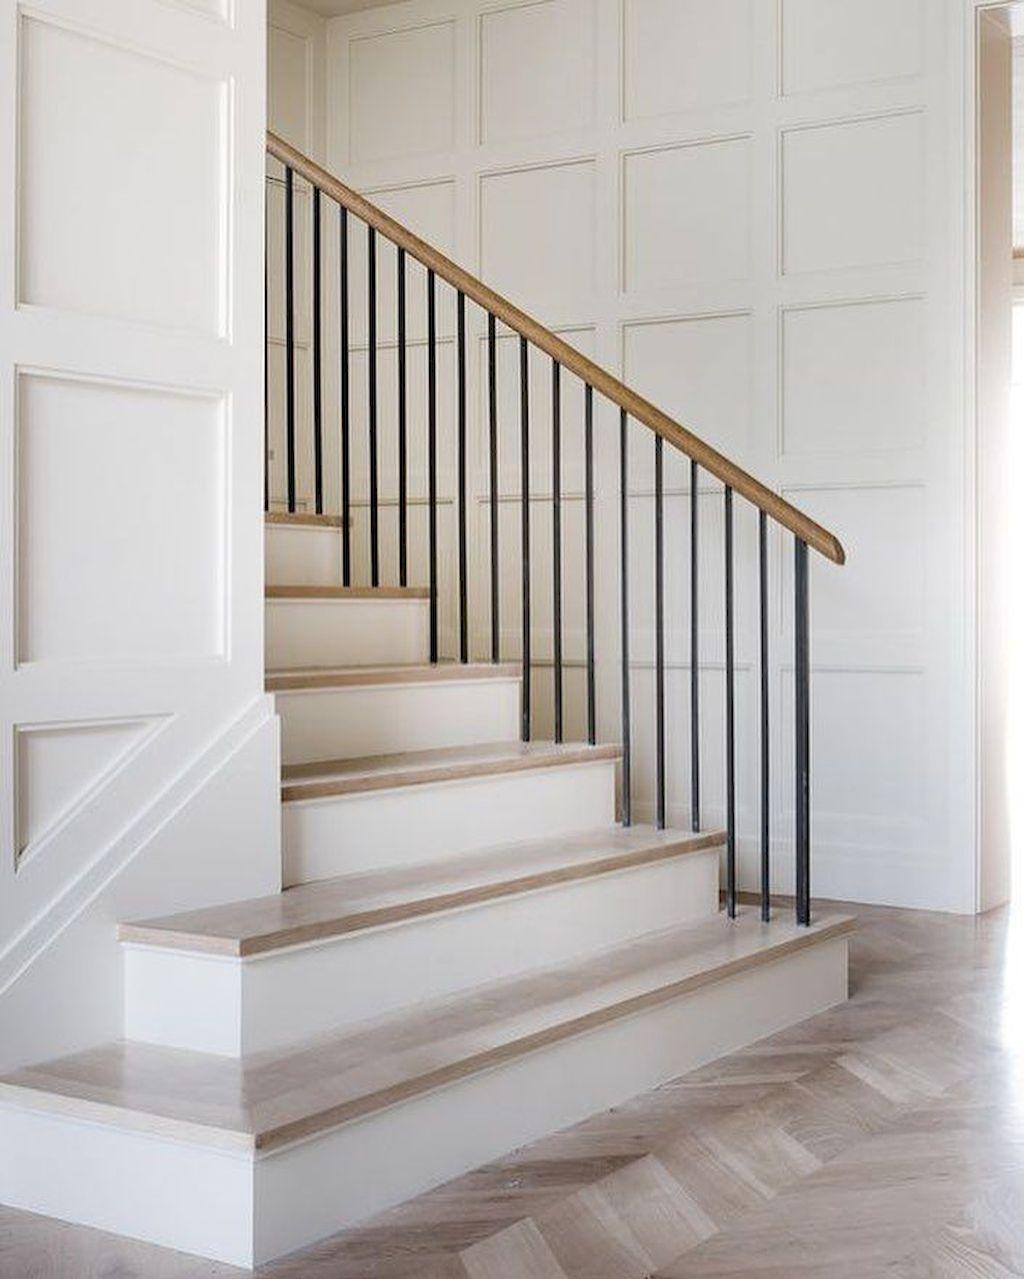 Staircase Railing158